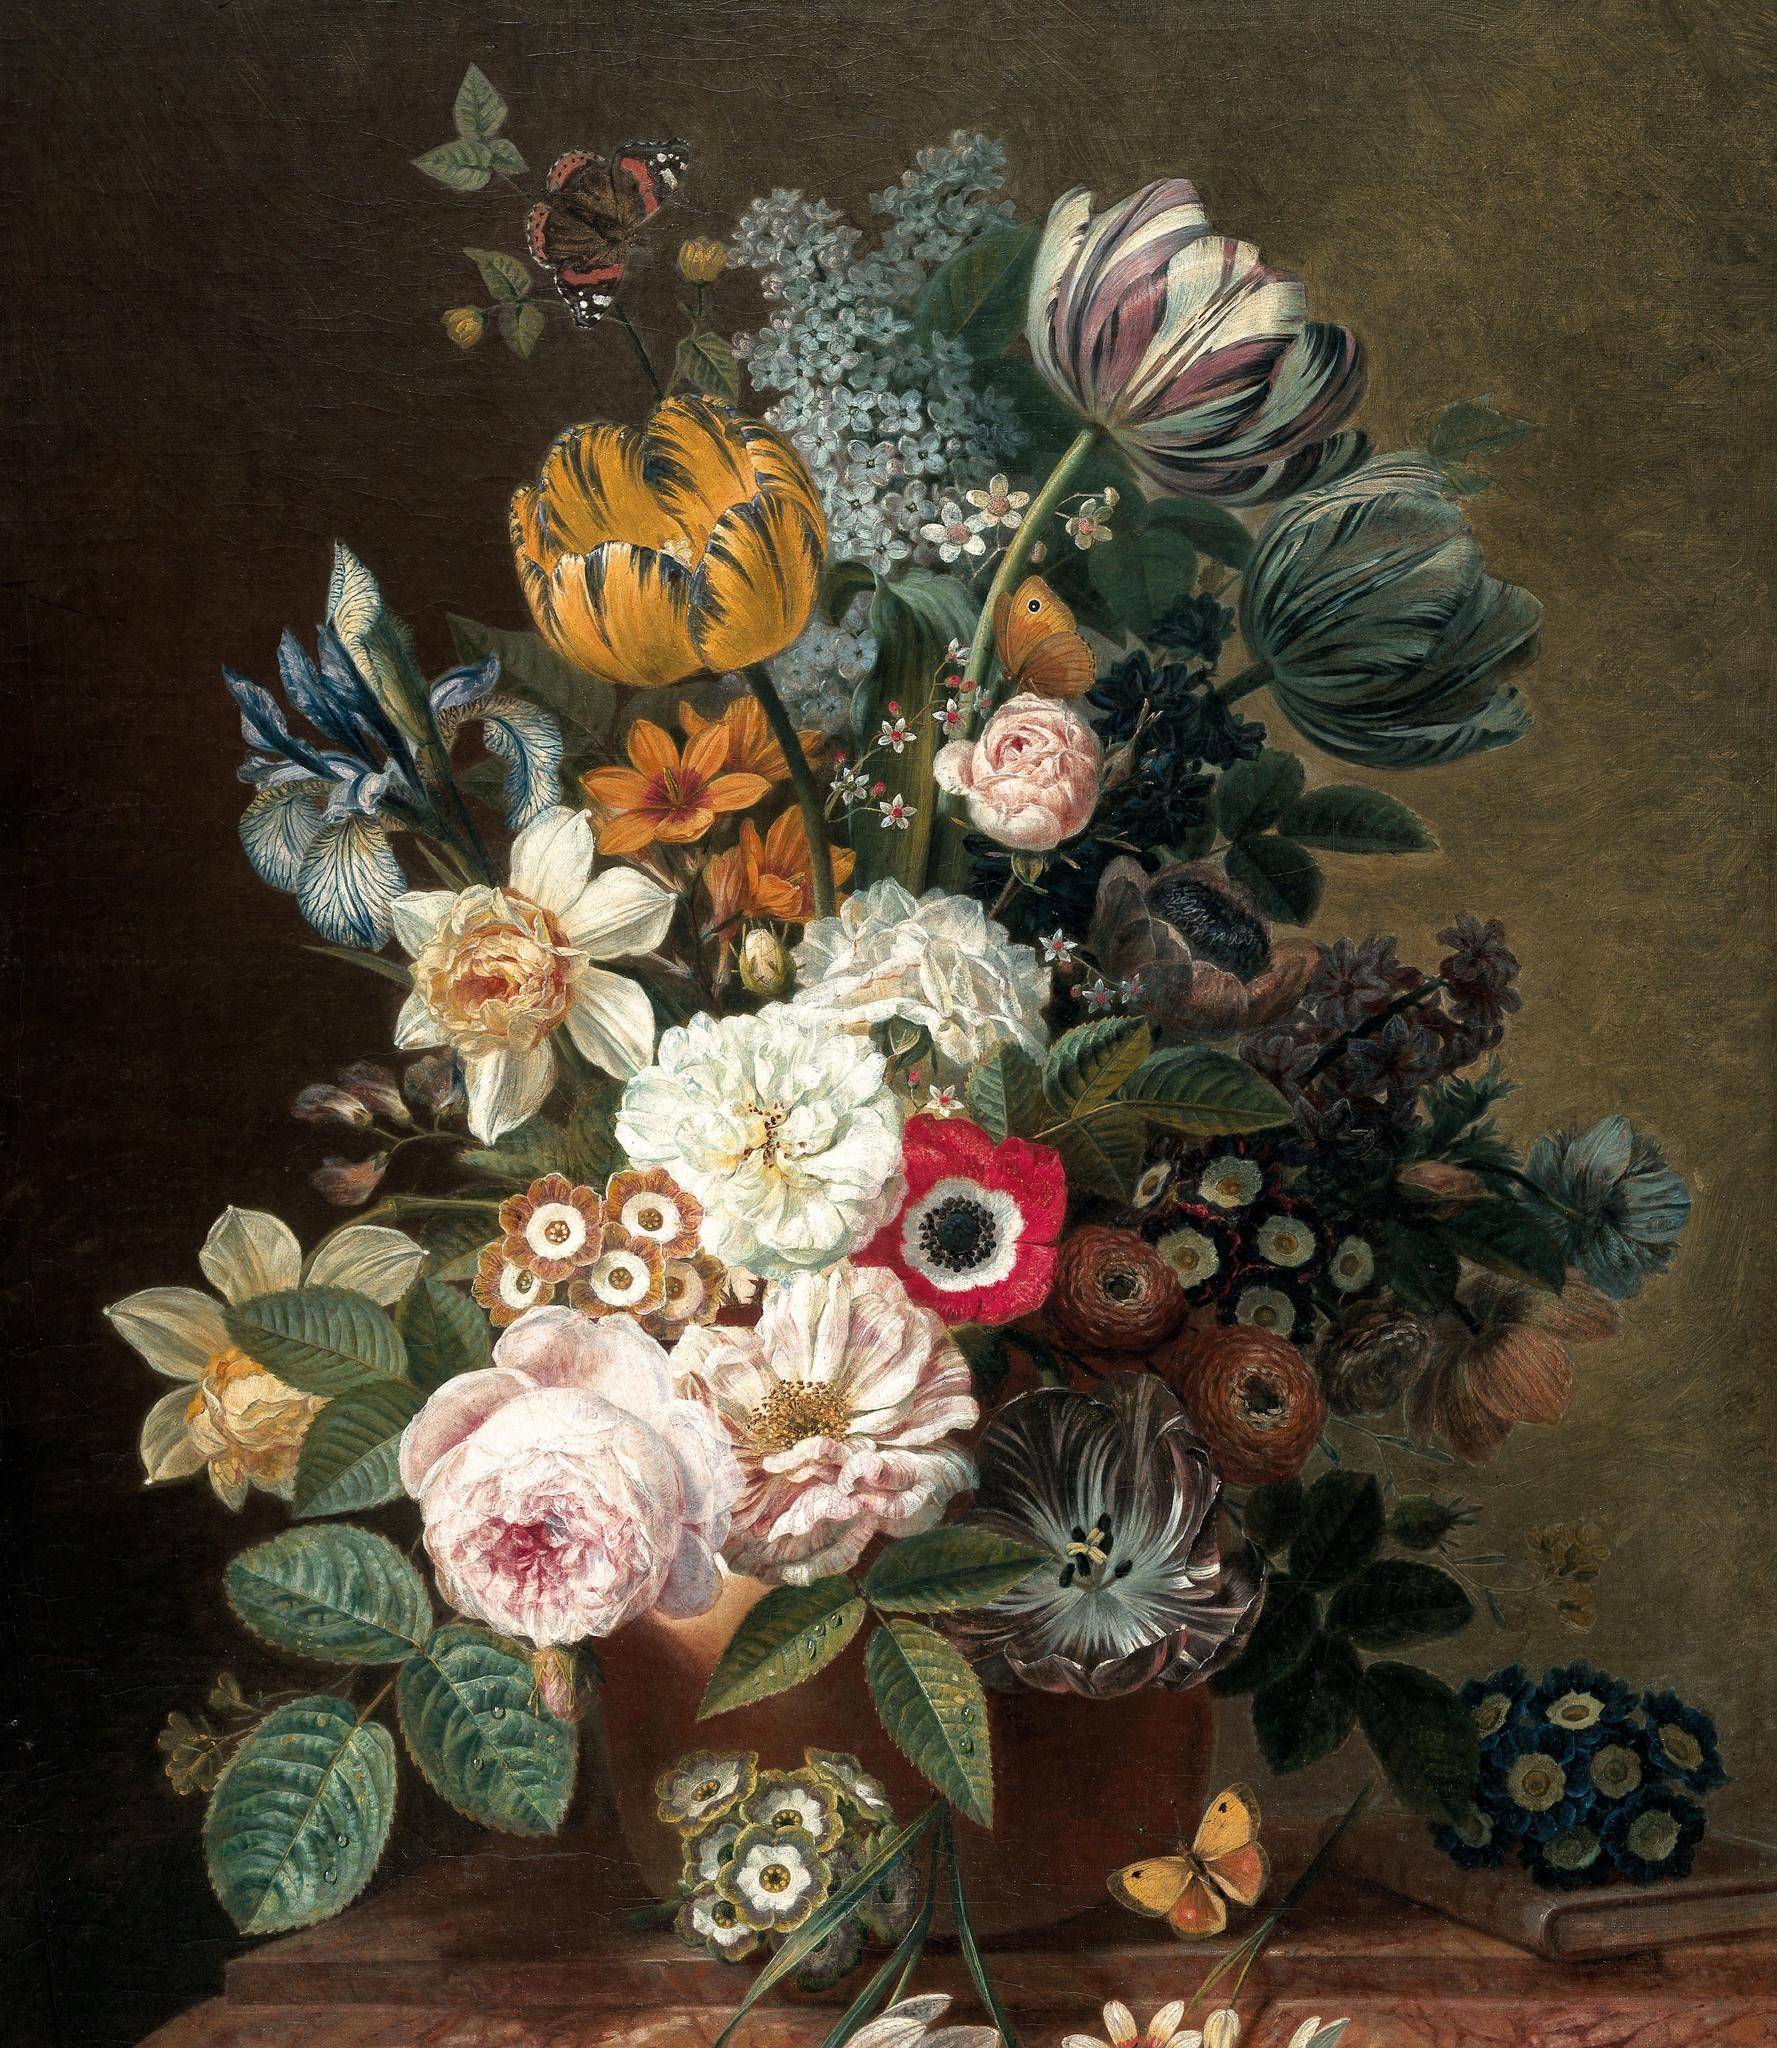 KEK Wallpaper Panel XL, Golden Age Flowers, 190x220cm-8719743888746-322